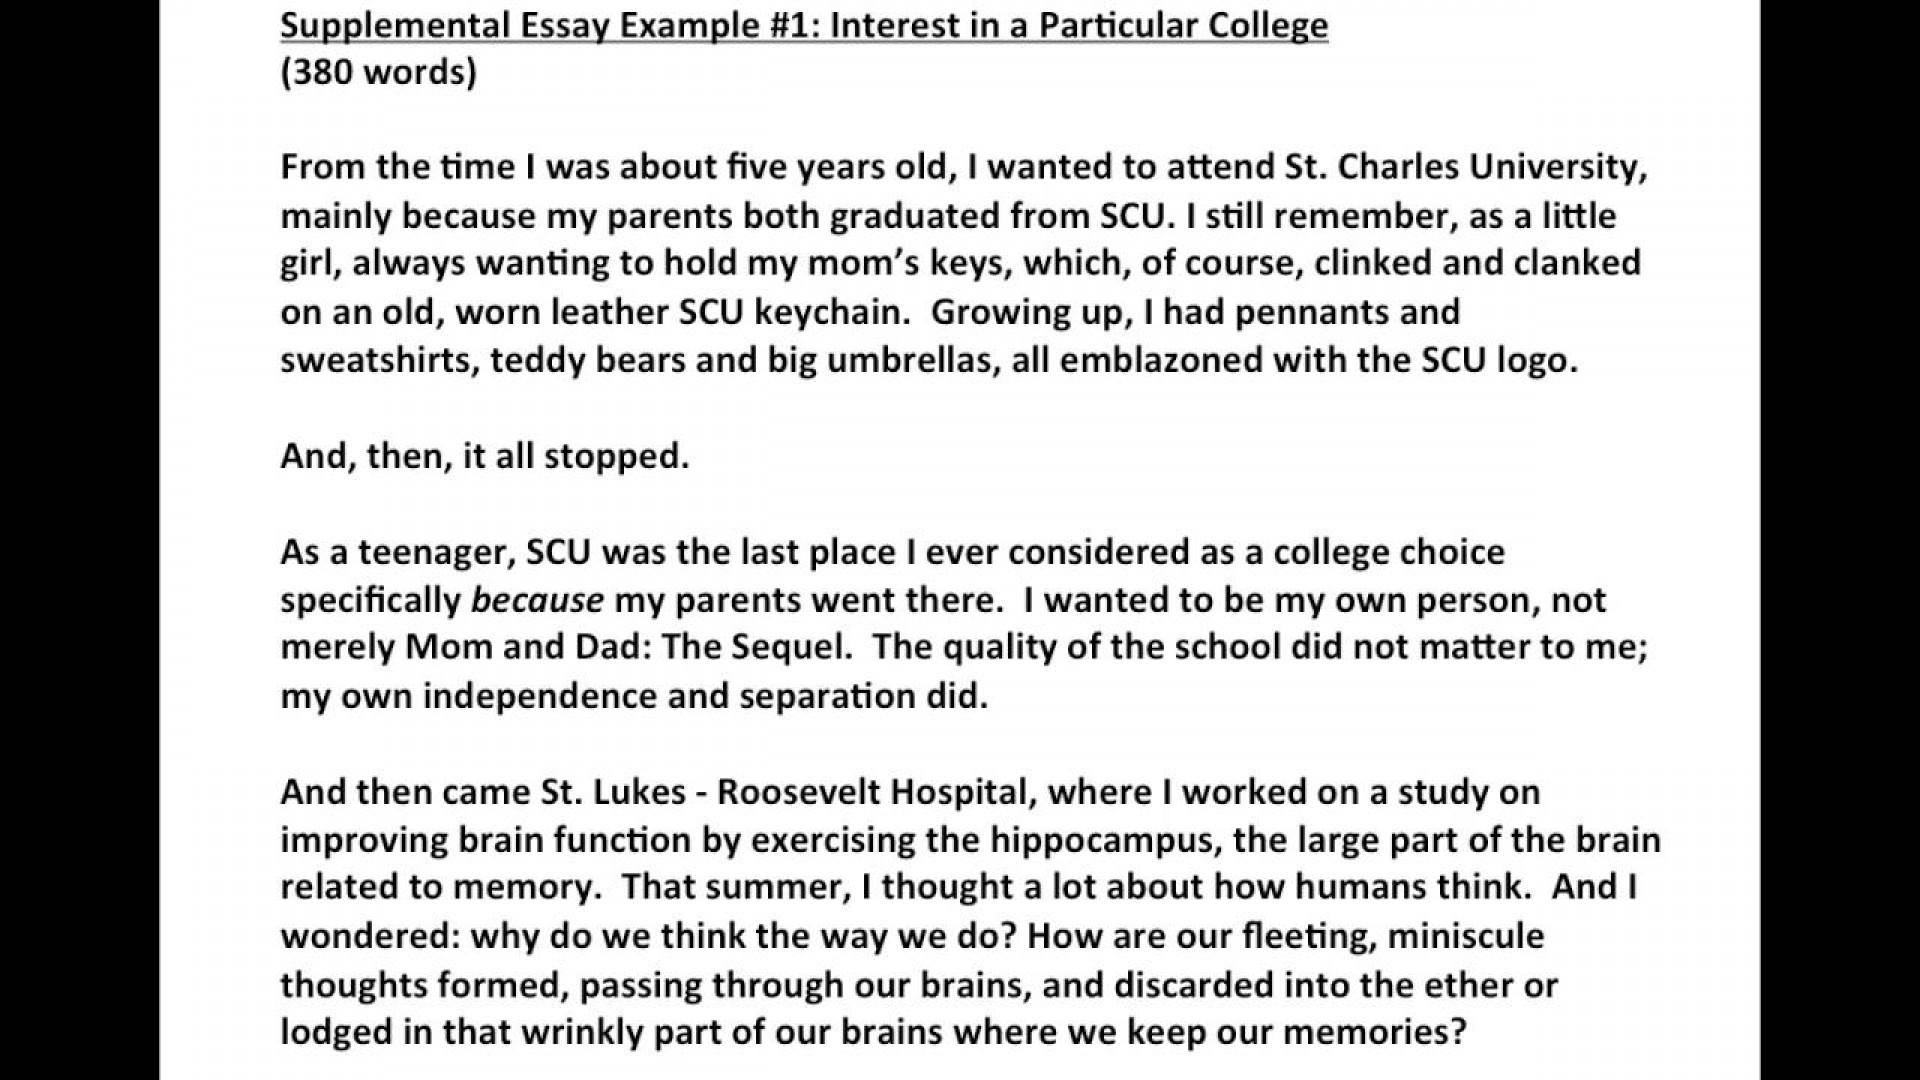 014 Maxresdefault Duke Supplement Essay Fearsome Collegevine Example Supplemental Reddit 1920